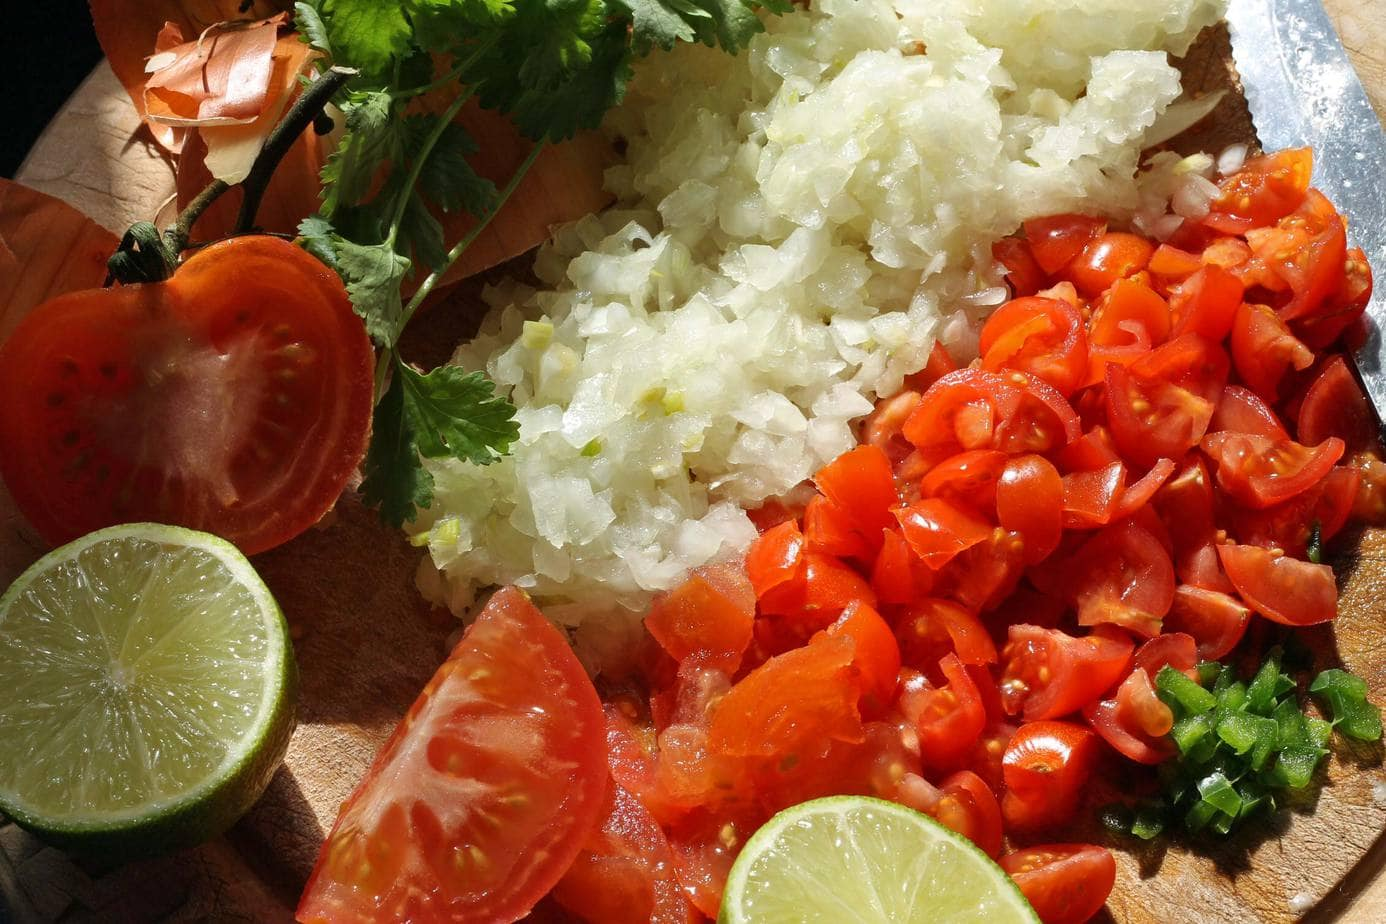 Pico de Gallo ingredients - chopped onion, tomato, cilantro, peppers, plus lime wedges.